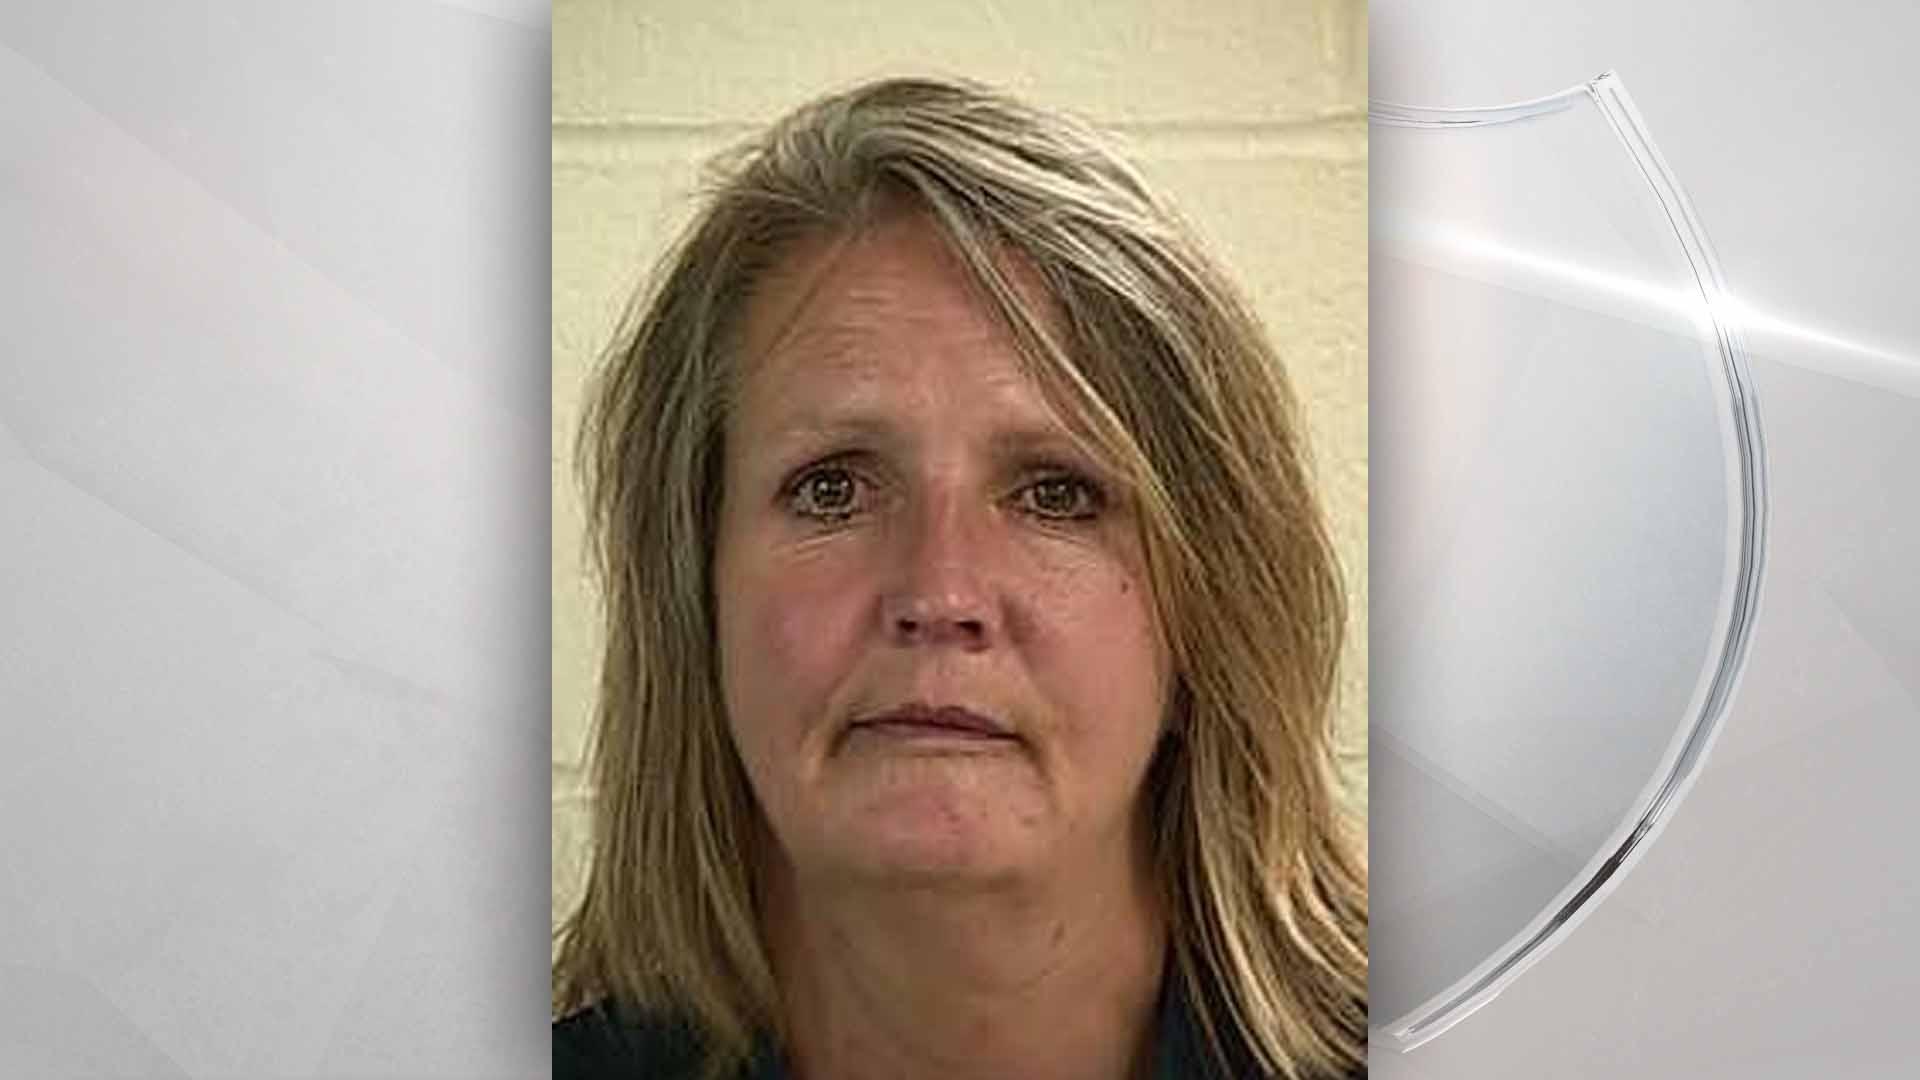 Arson suspect arrested in Grants Pass